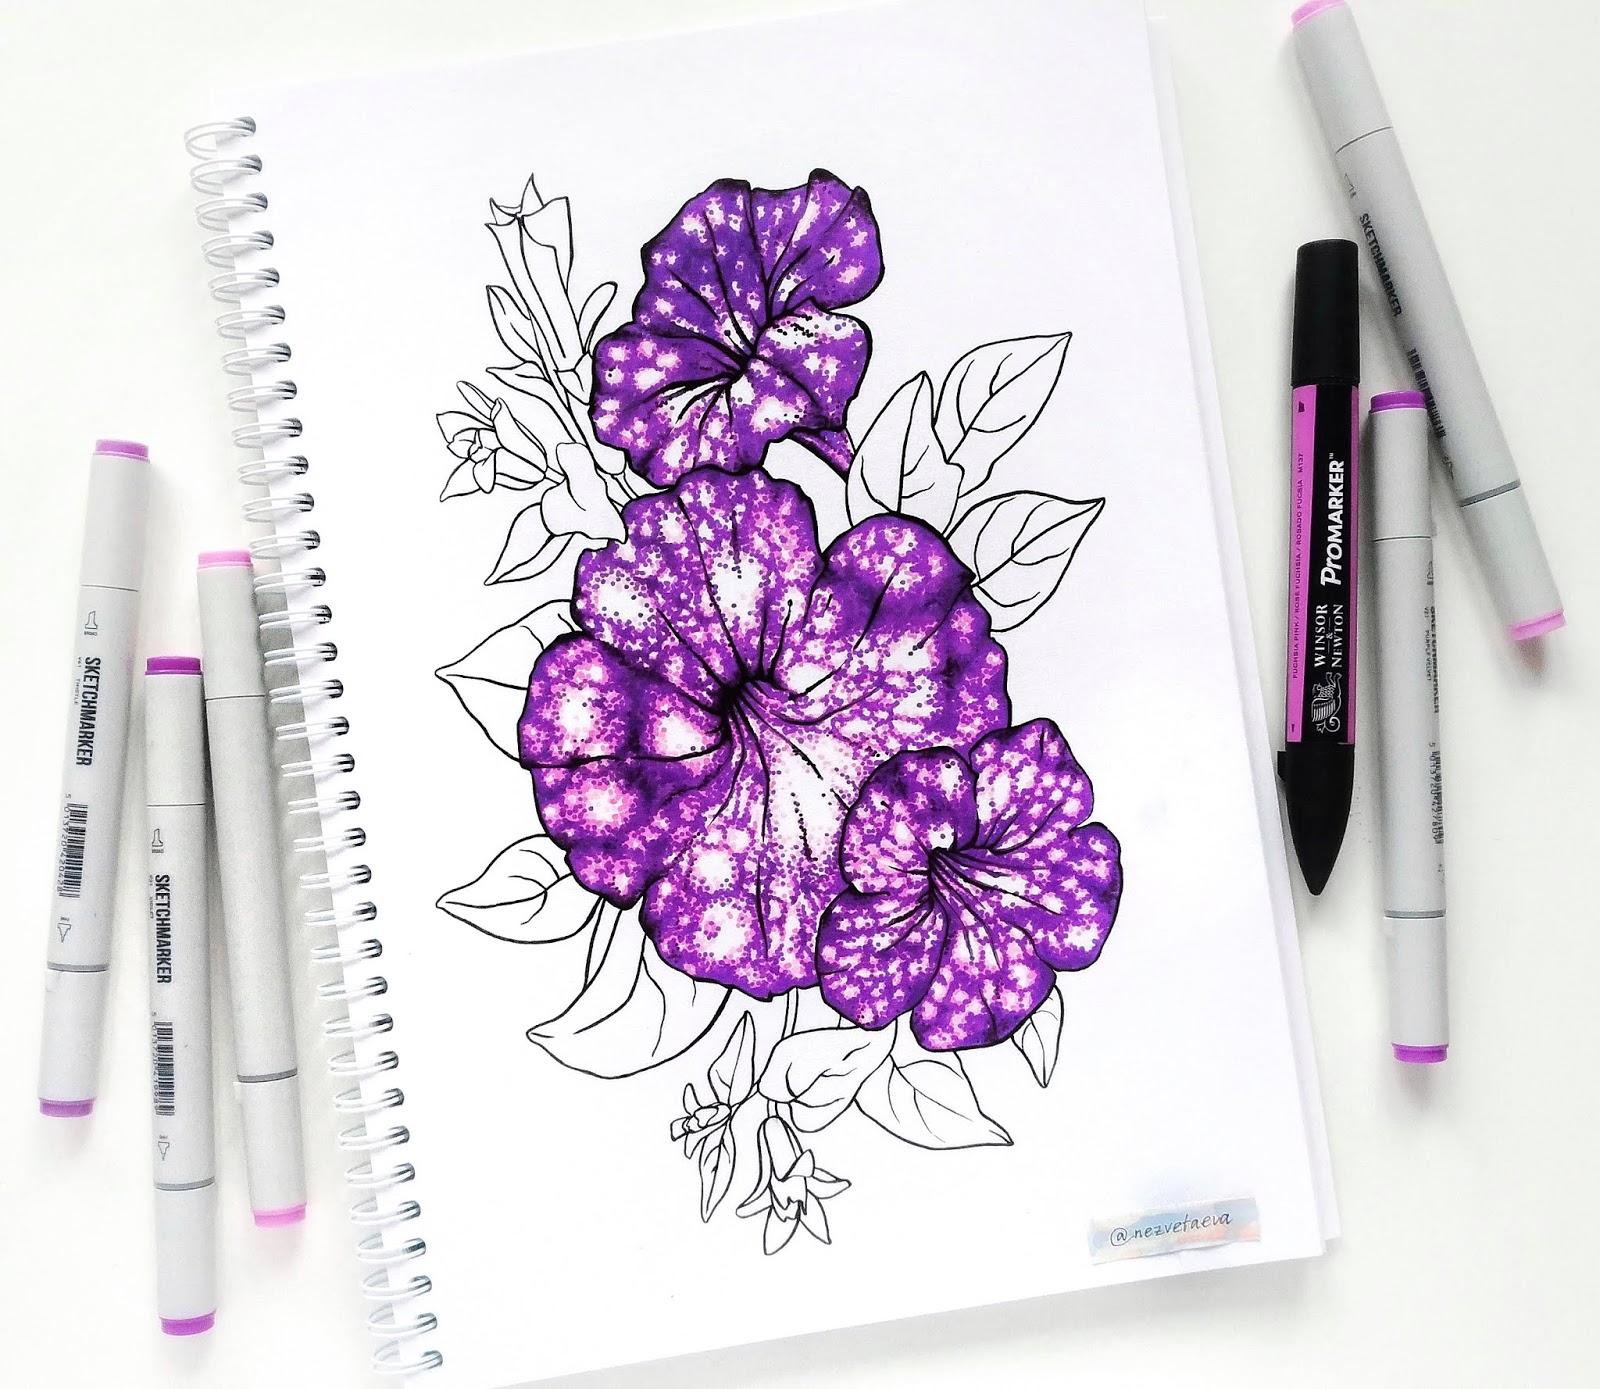 Sonia nezvetaeva, marker sketch, flower illustration, Petunia, Violet, Copic, Sketchmarkers, Promarker